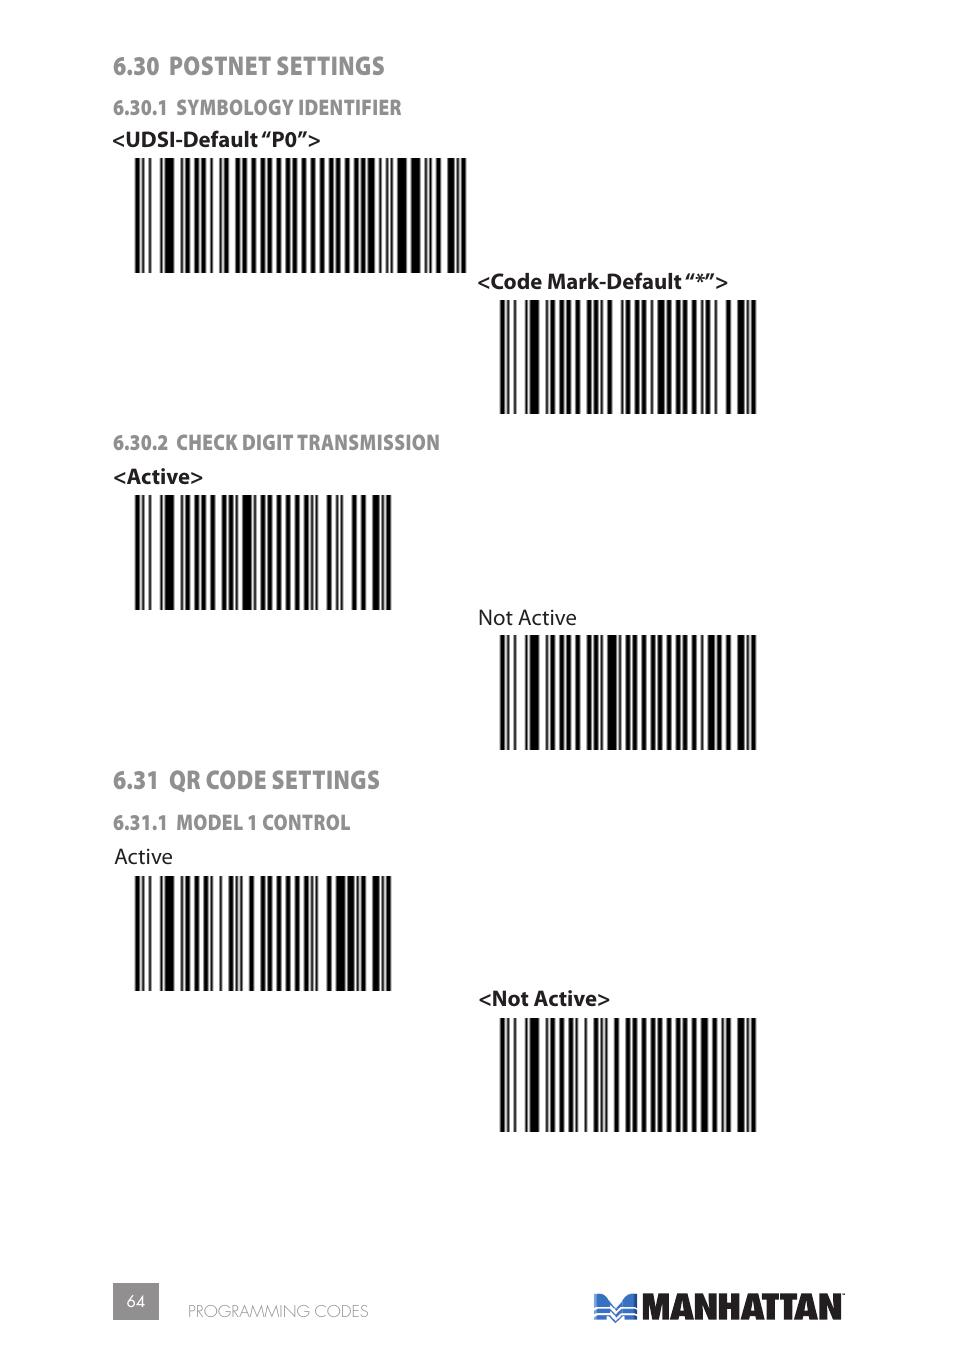 30 postnet settings, 31 qr code settings | Manhattan 177603